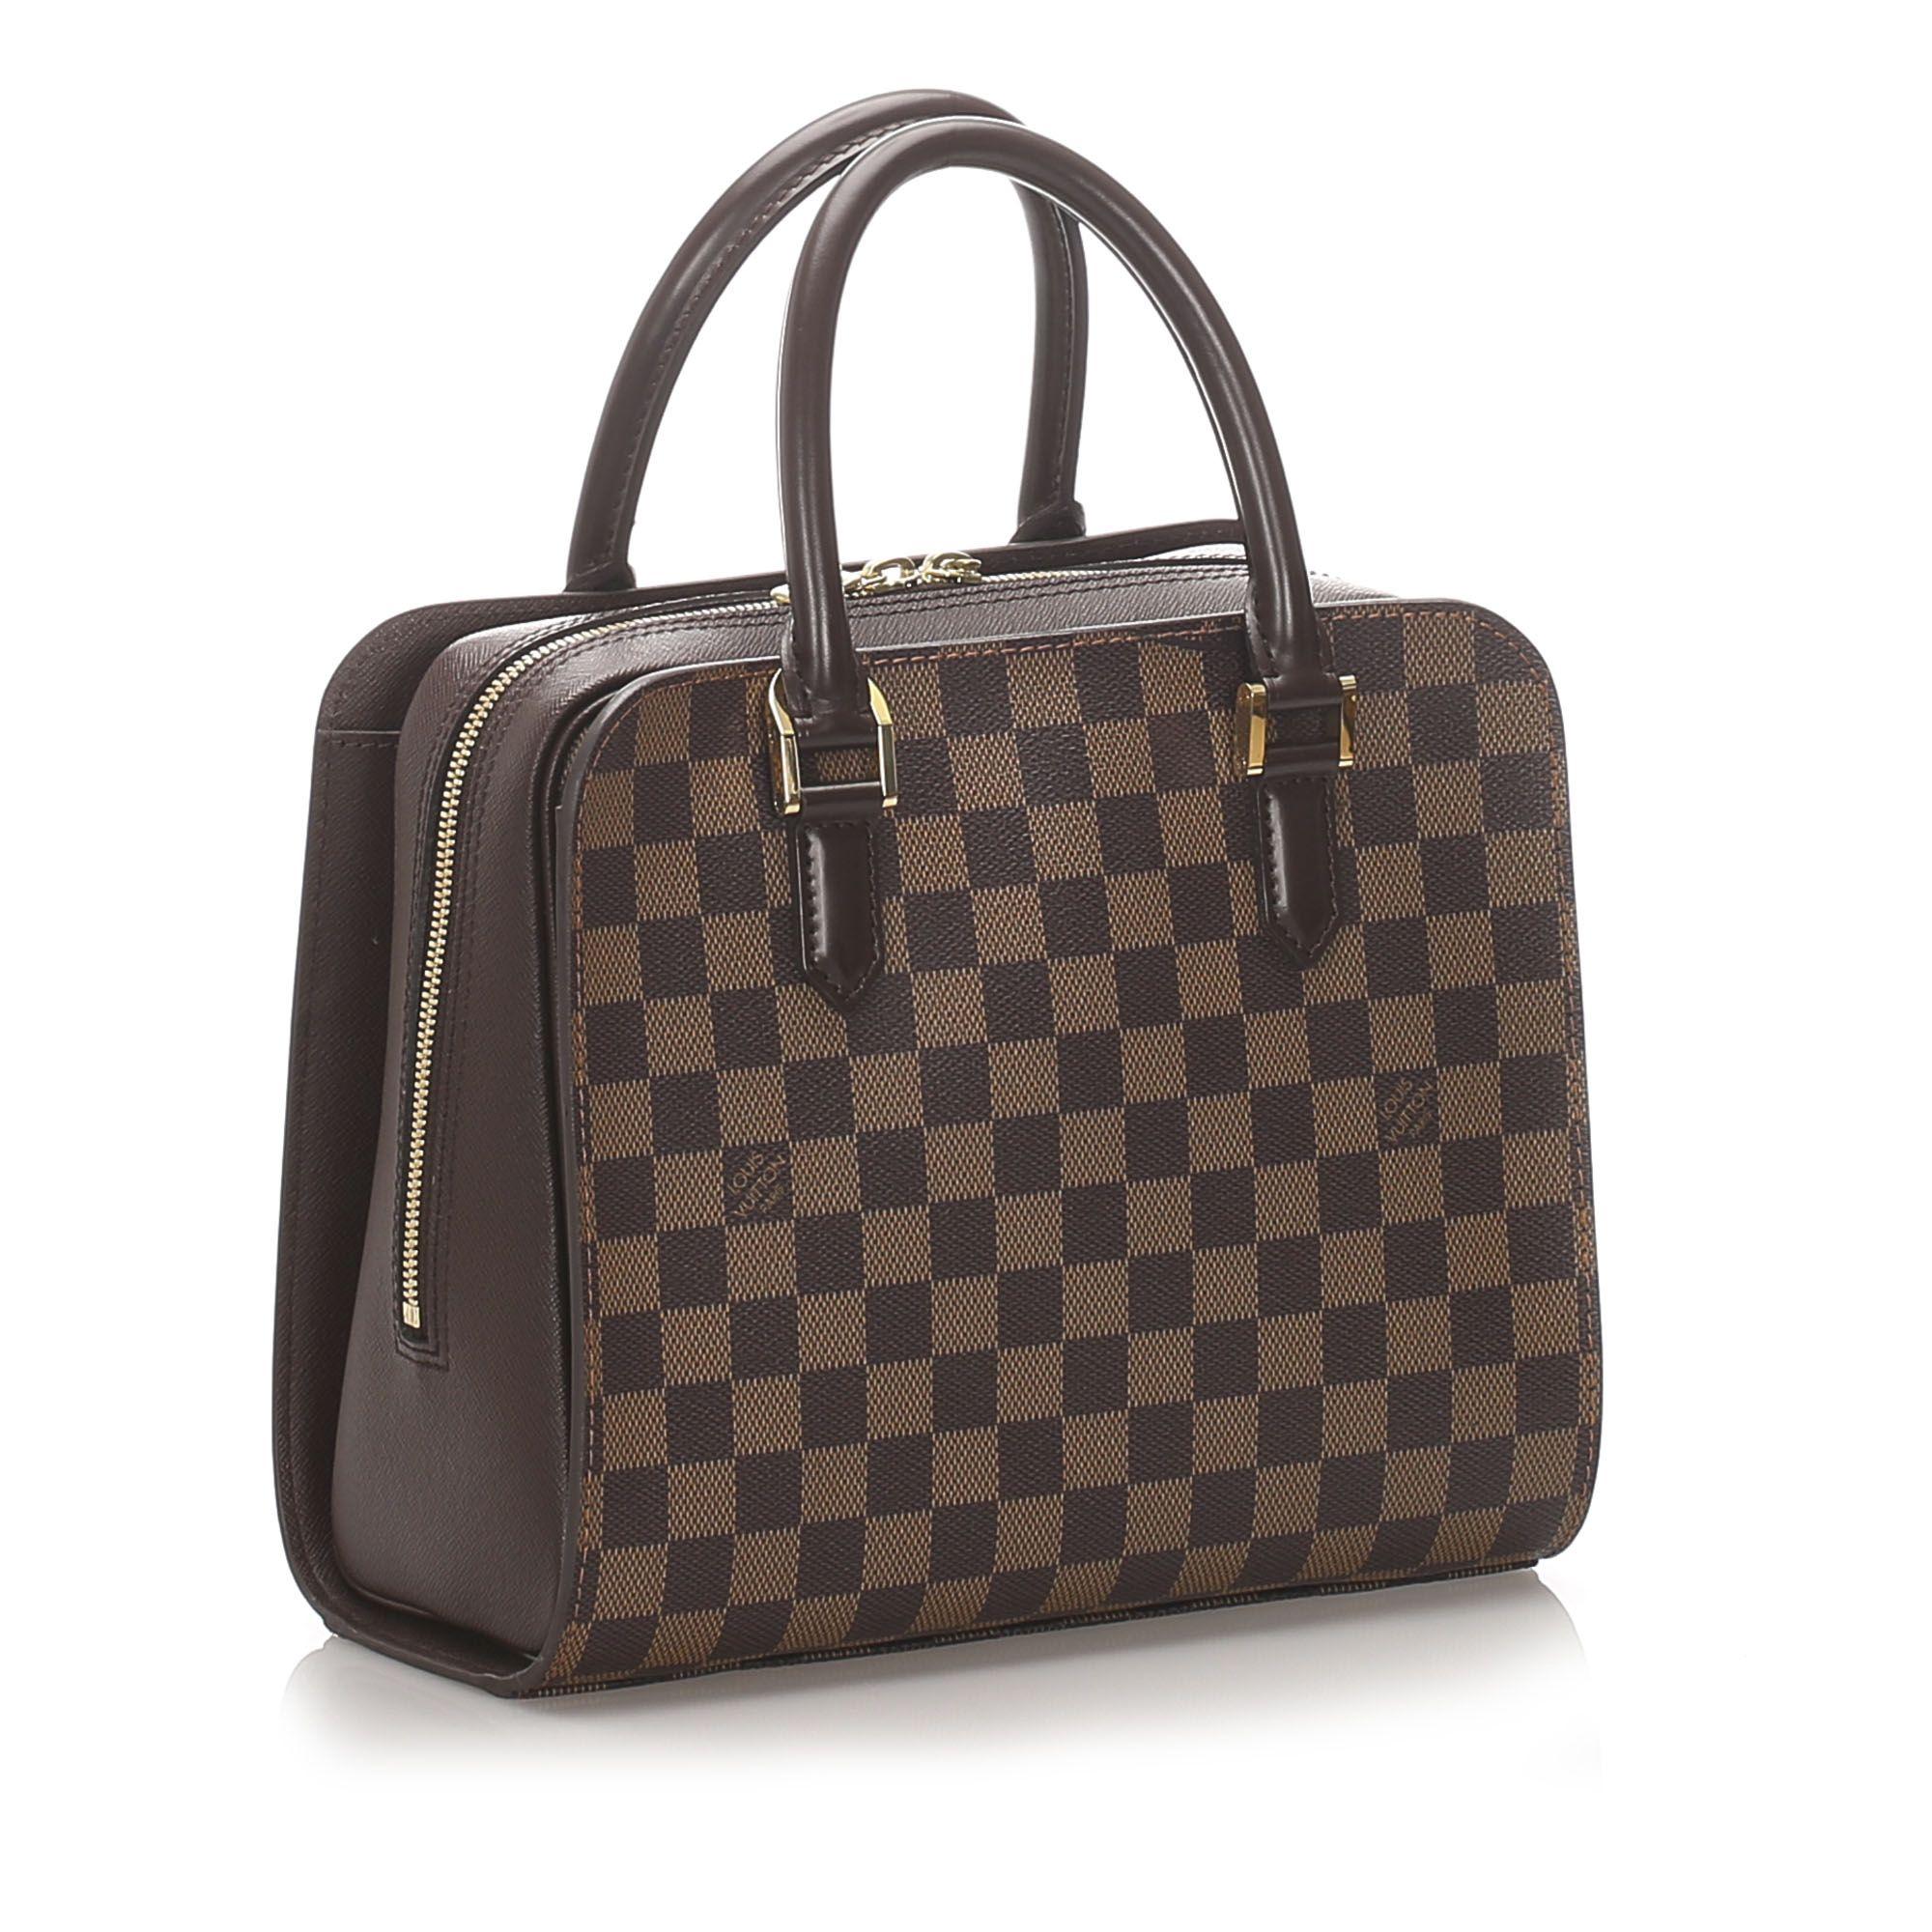 Vintage Louis Vuitton Damier Ebene Triana Brown